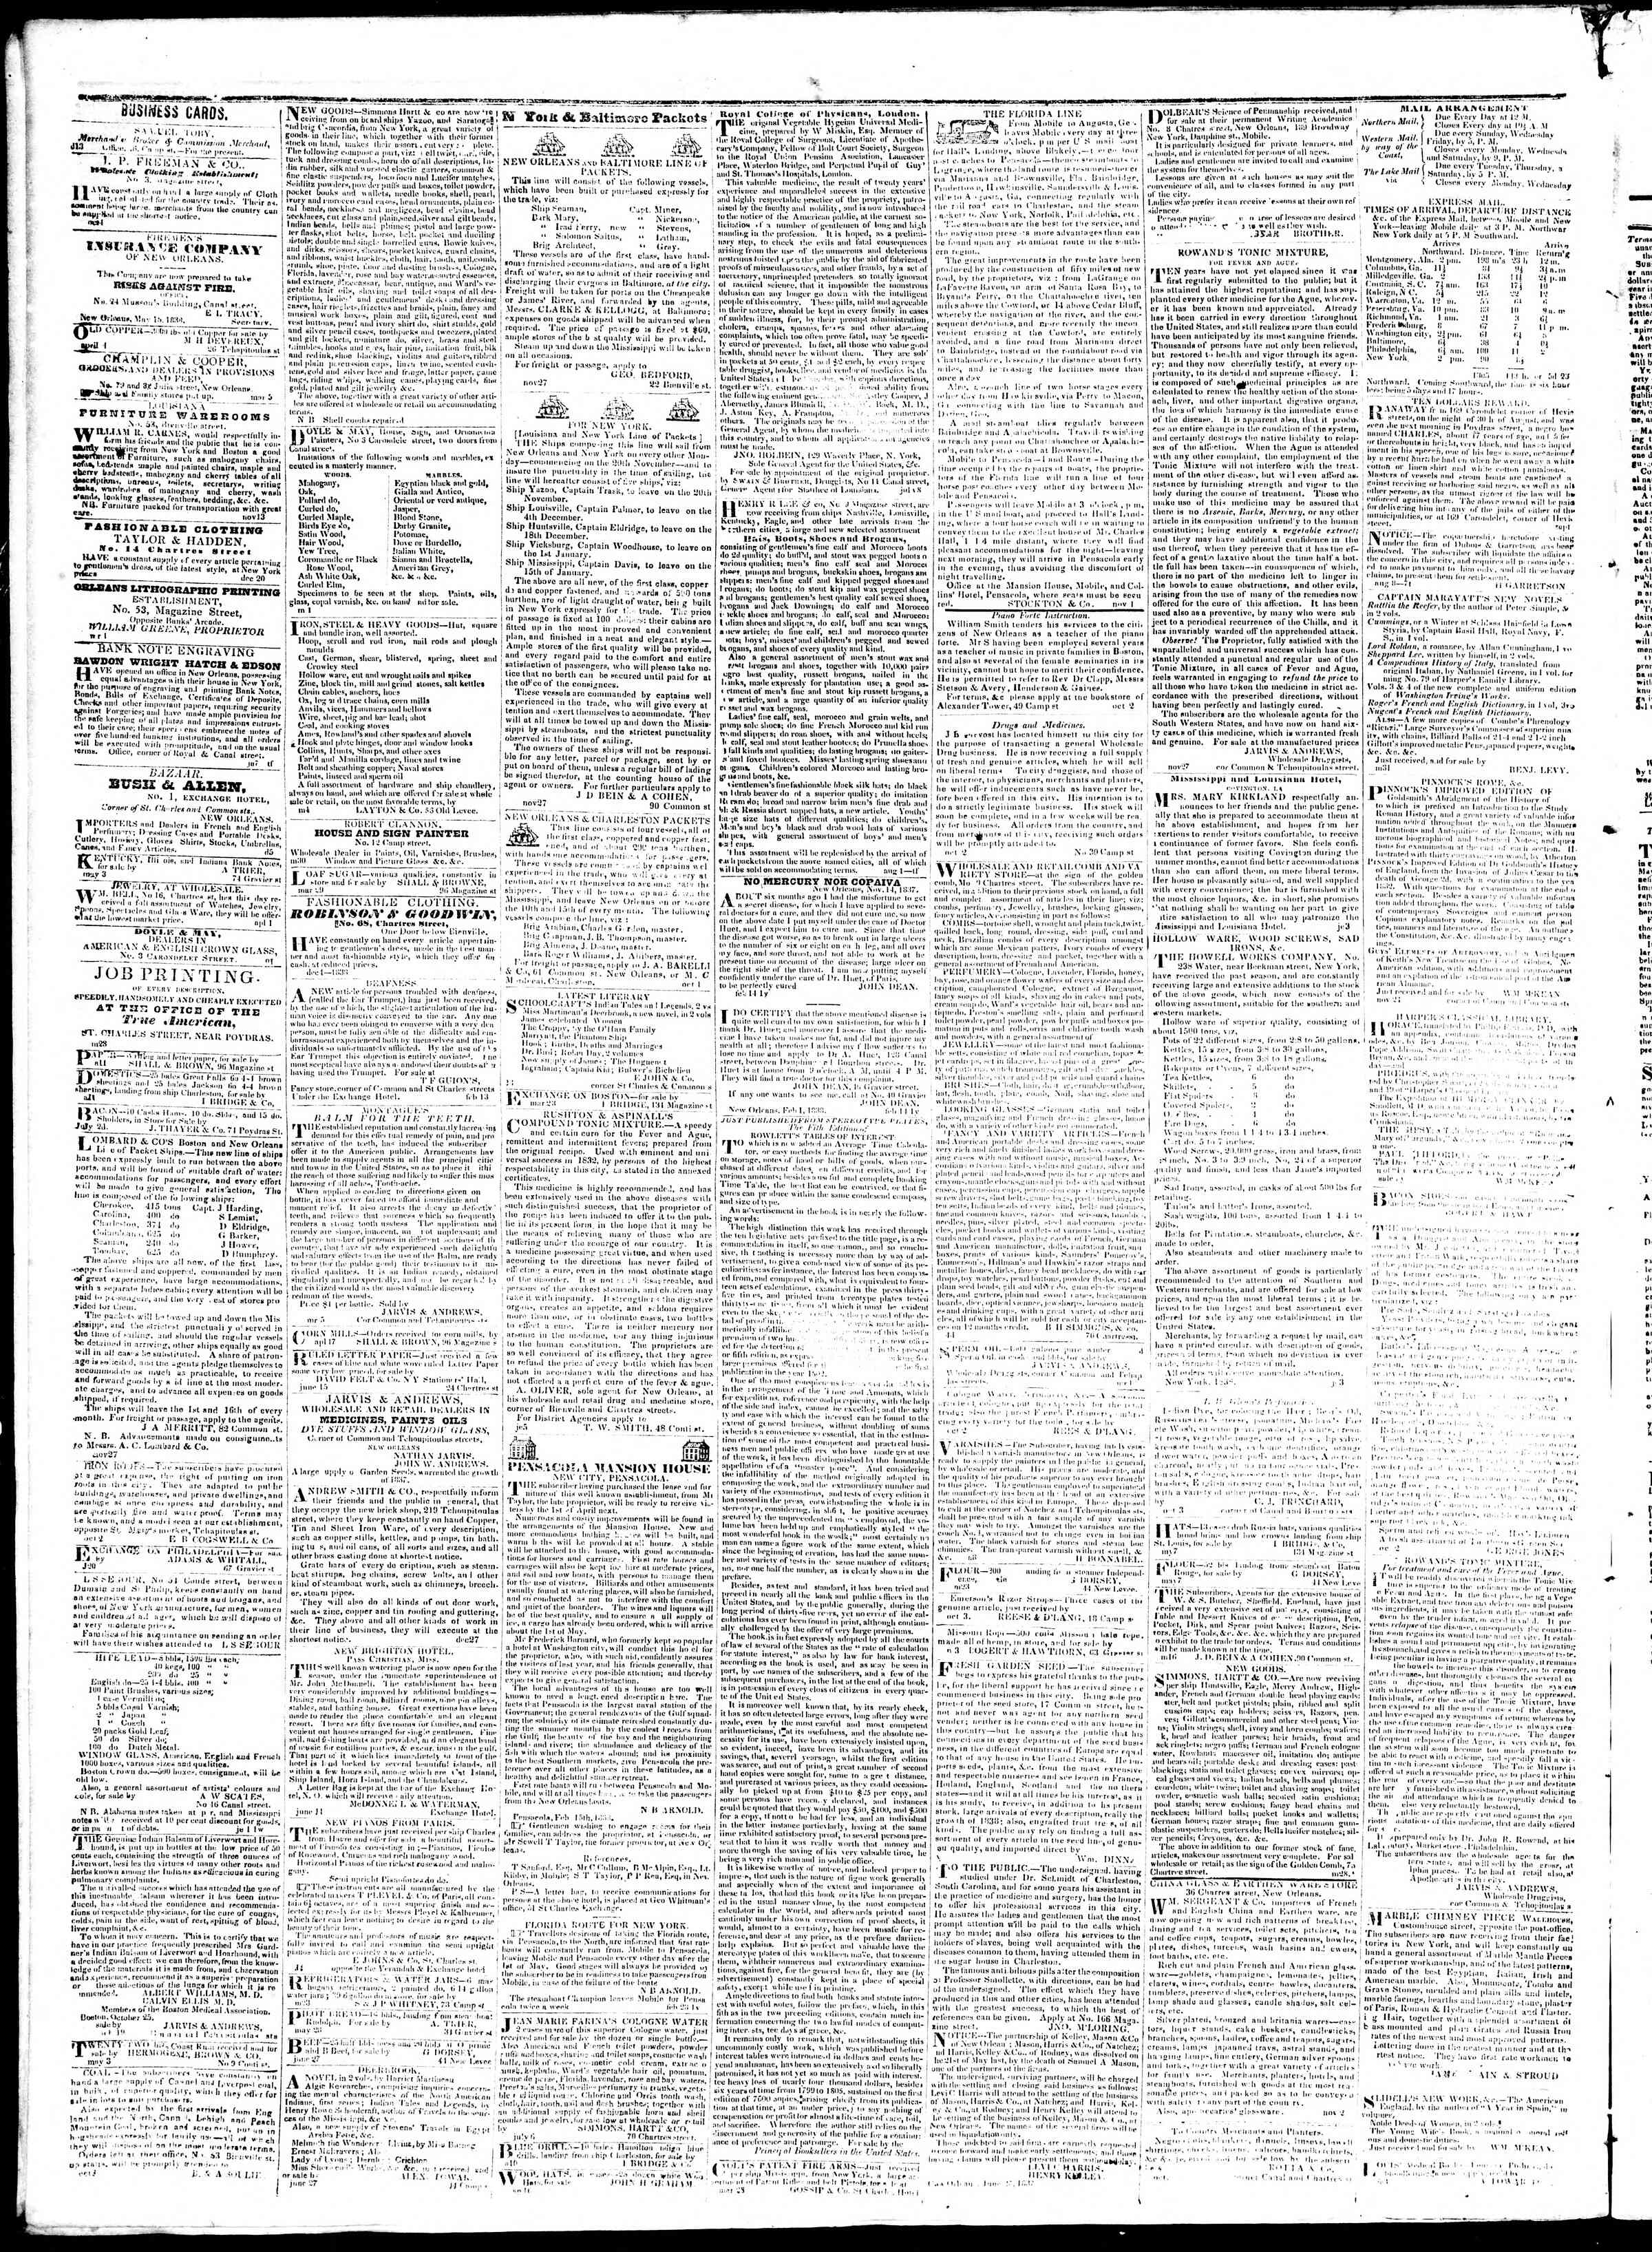 September 24, 1839 Tarihli True American Gazetesi Sayfa 4